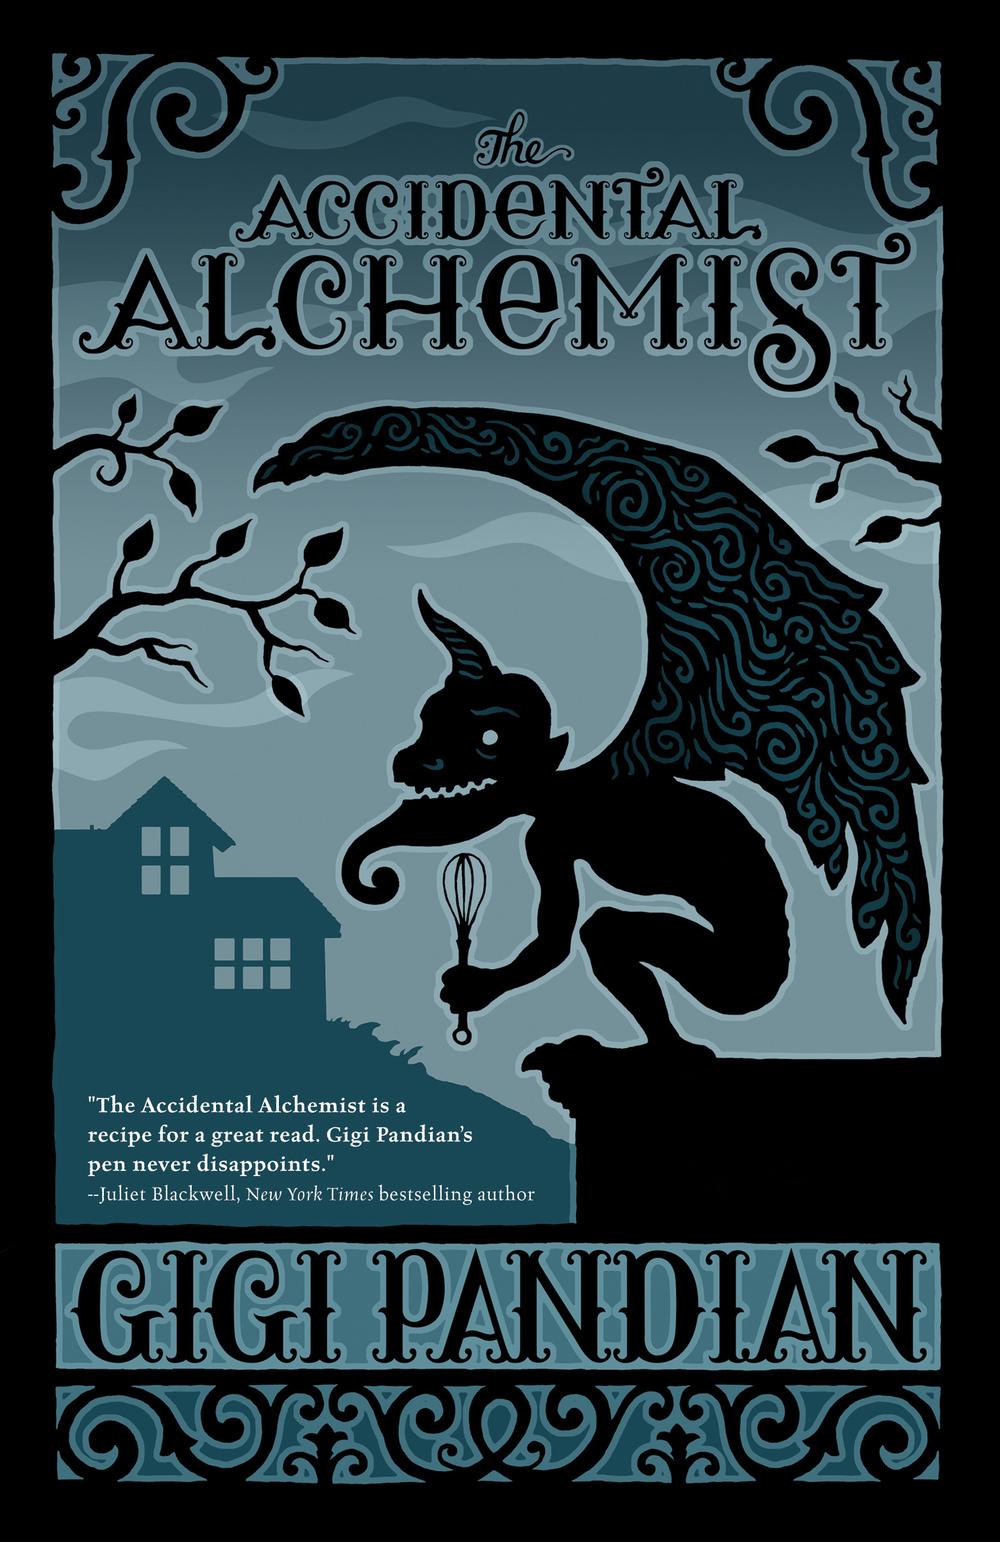 Accidental-Alchemist.jpg